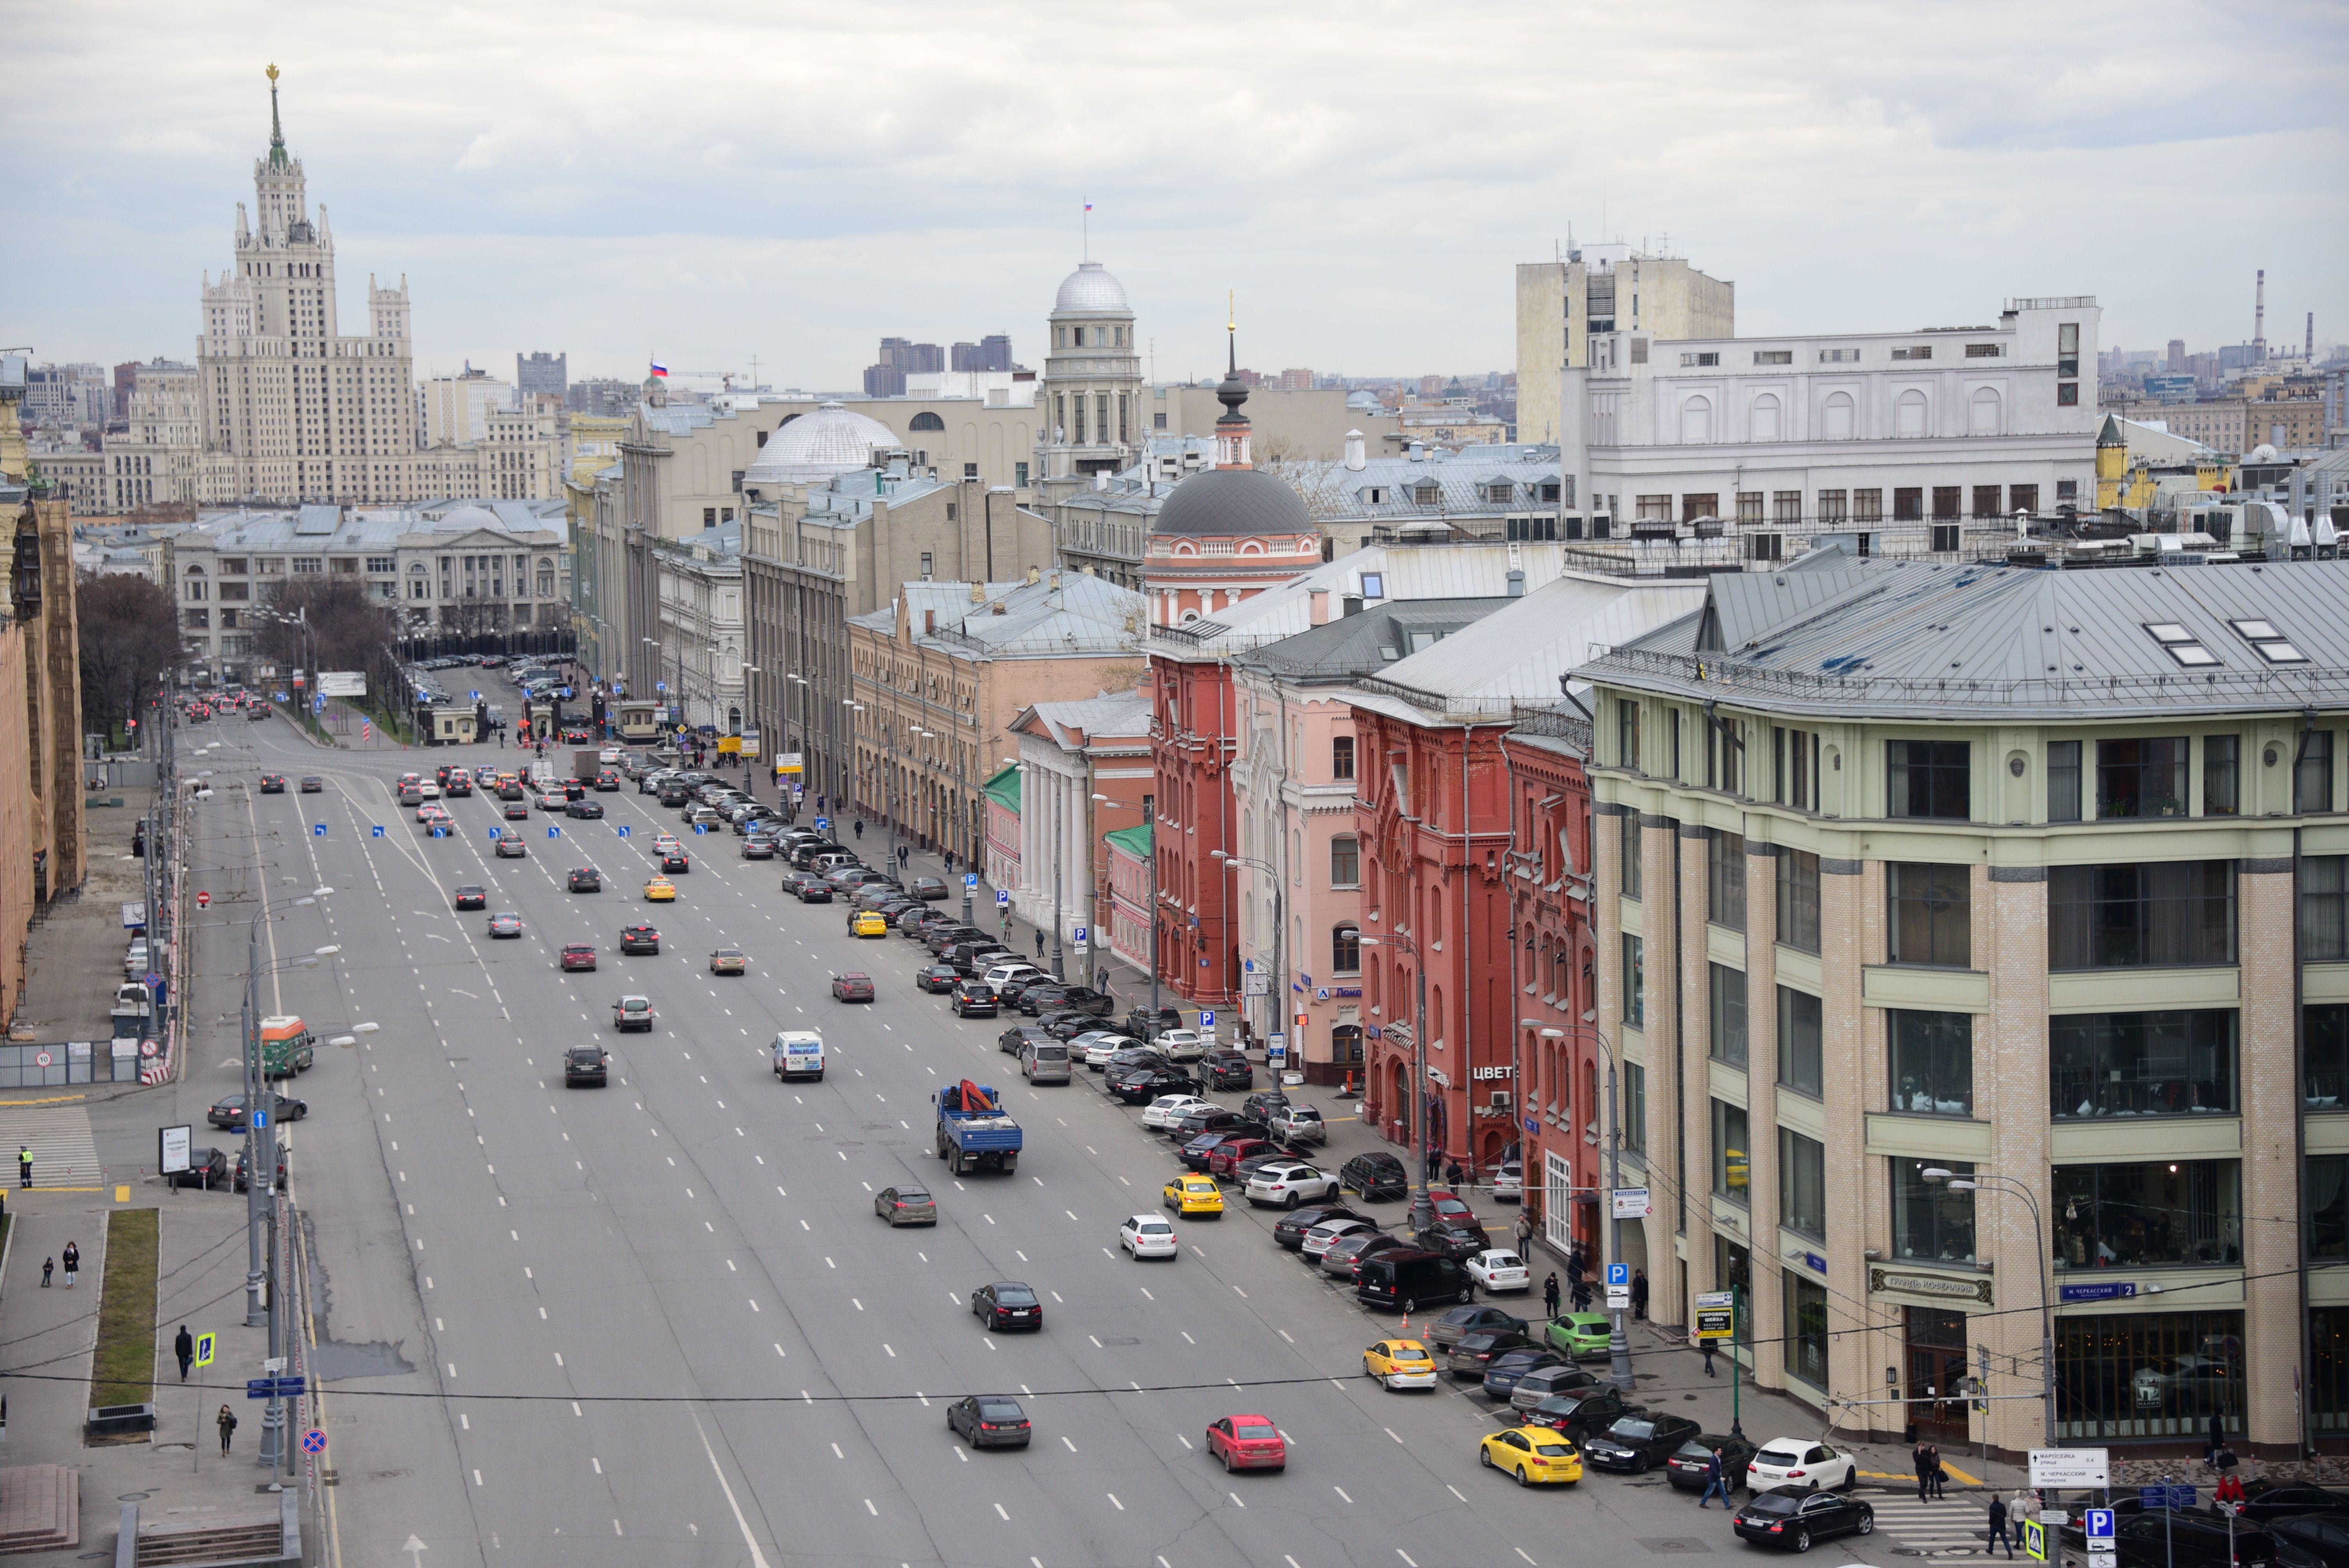 Погода в Москве порадует 22 градусами тепла